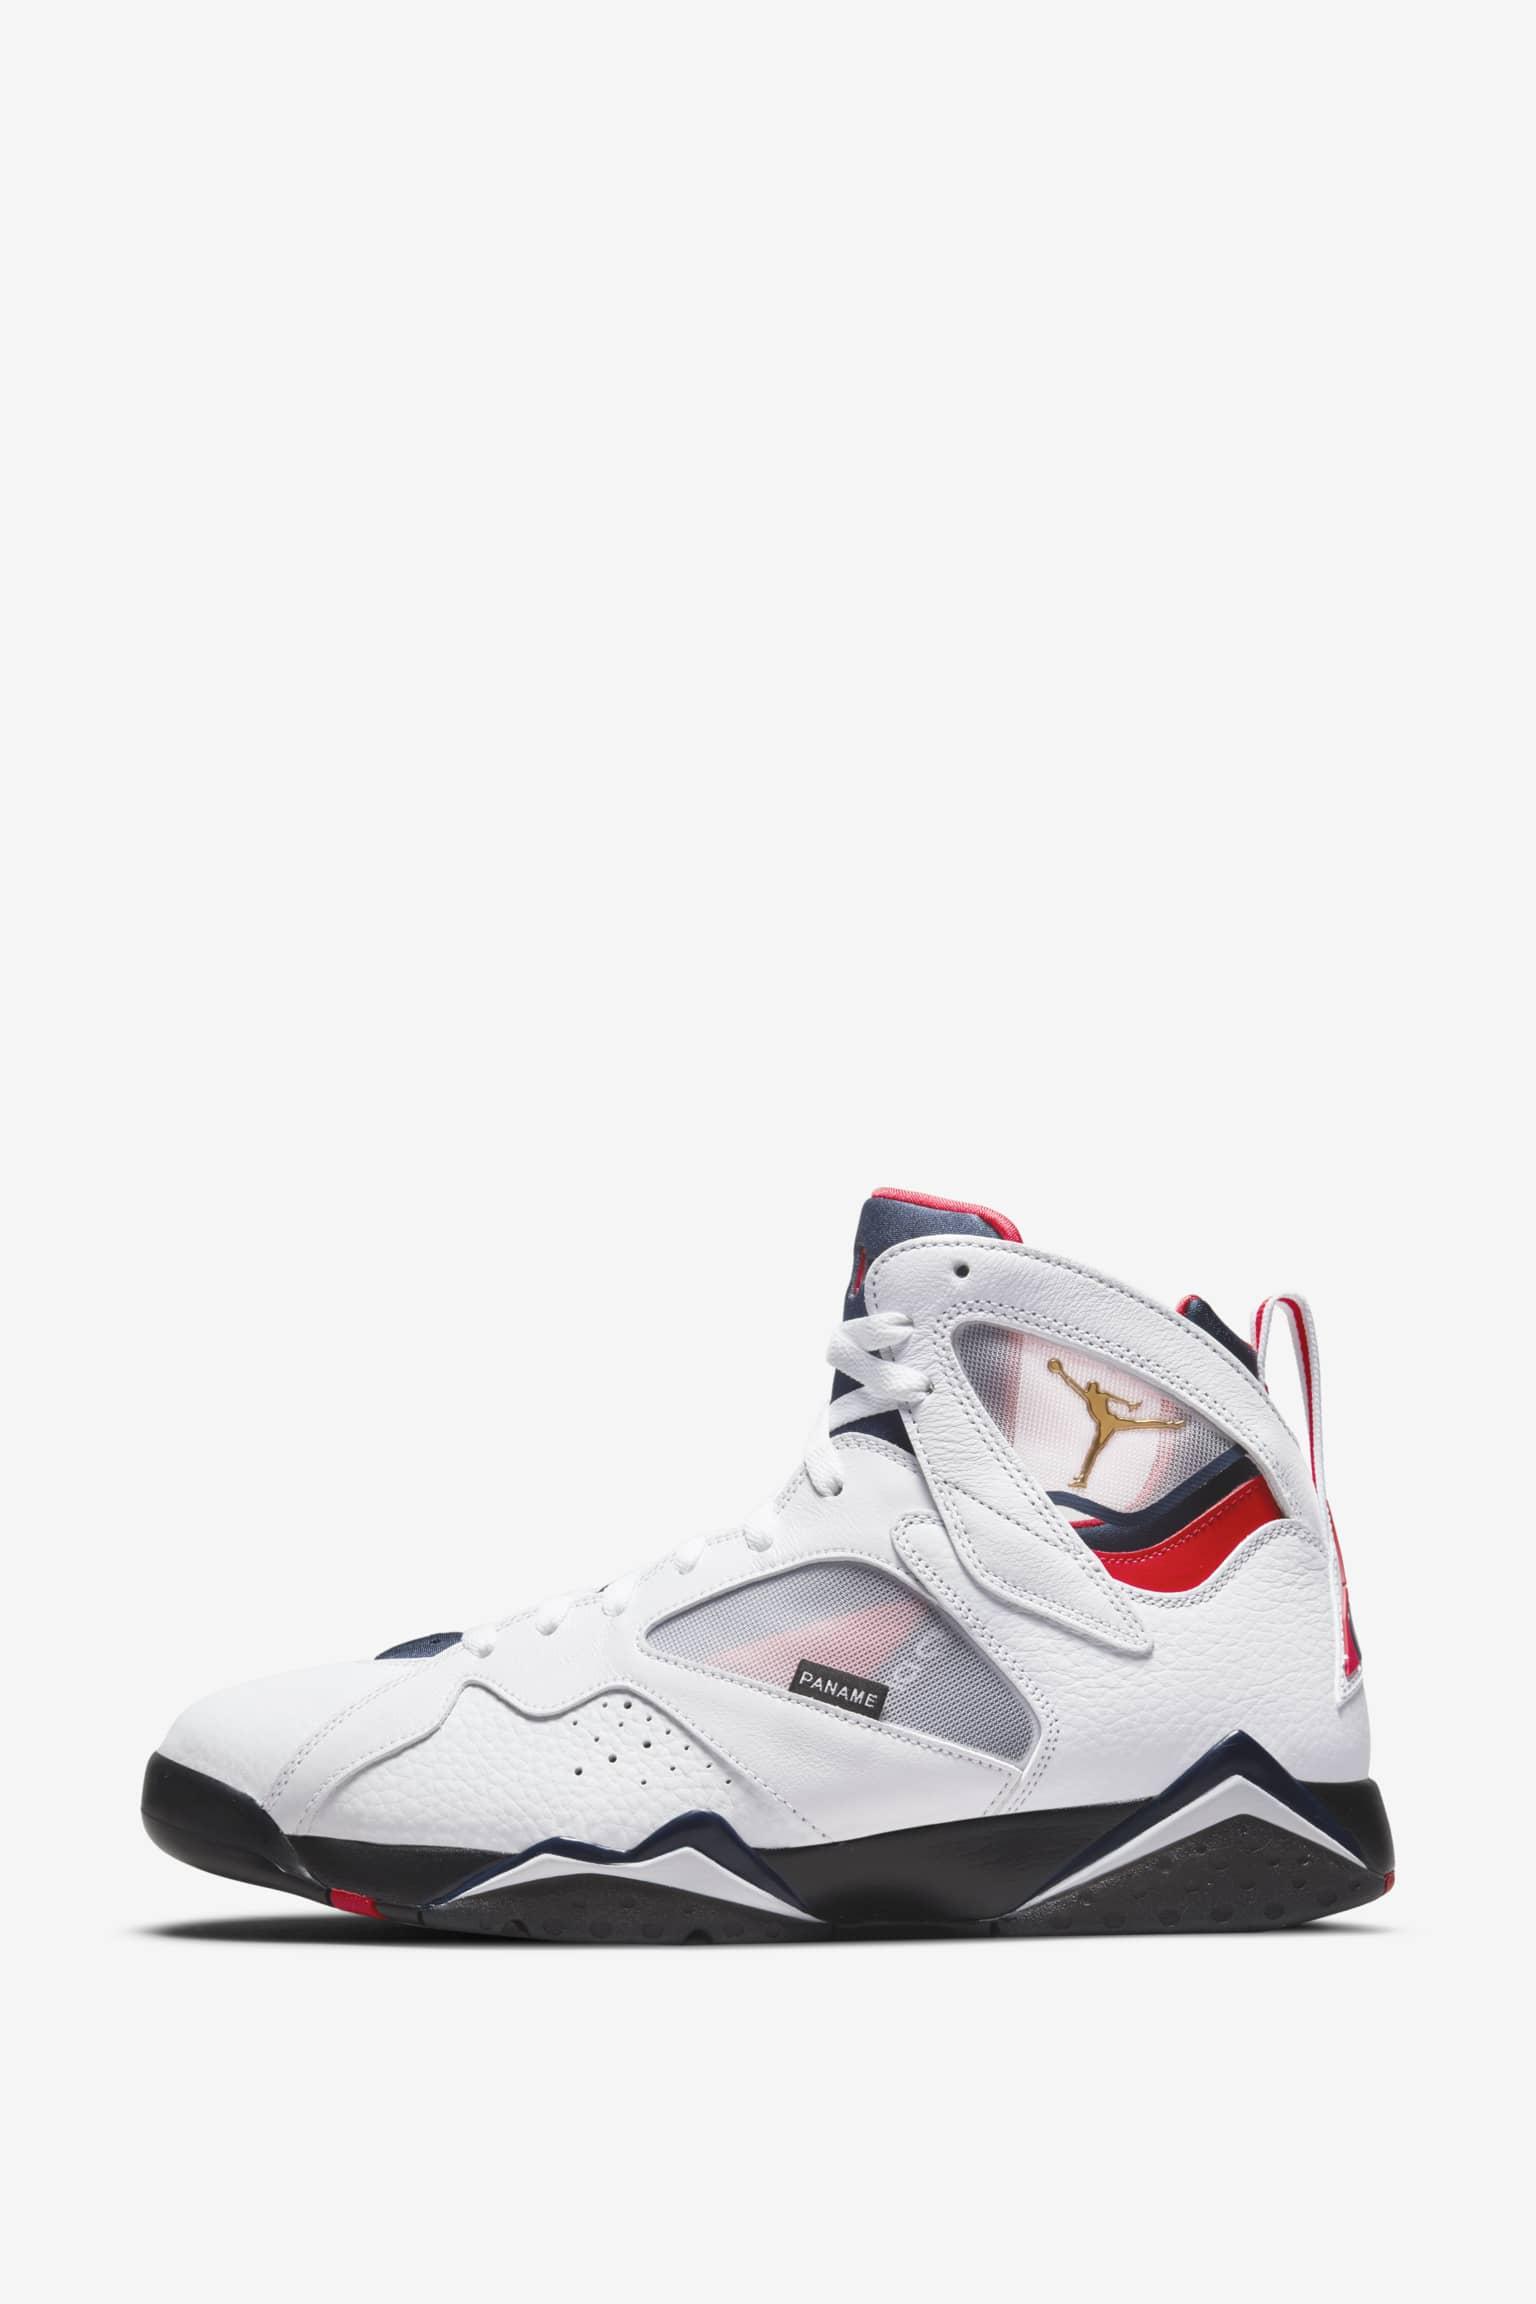 Air Jordan 7 'Paris Saint-Germain' Release Date. Nike SNKRS ID